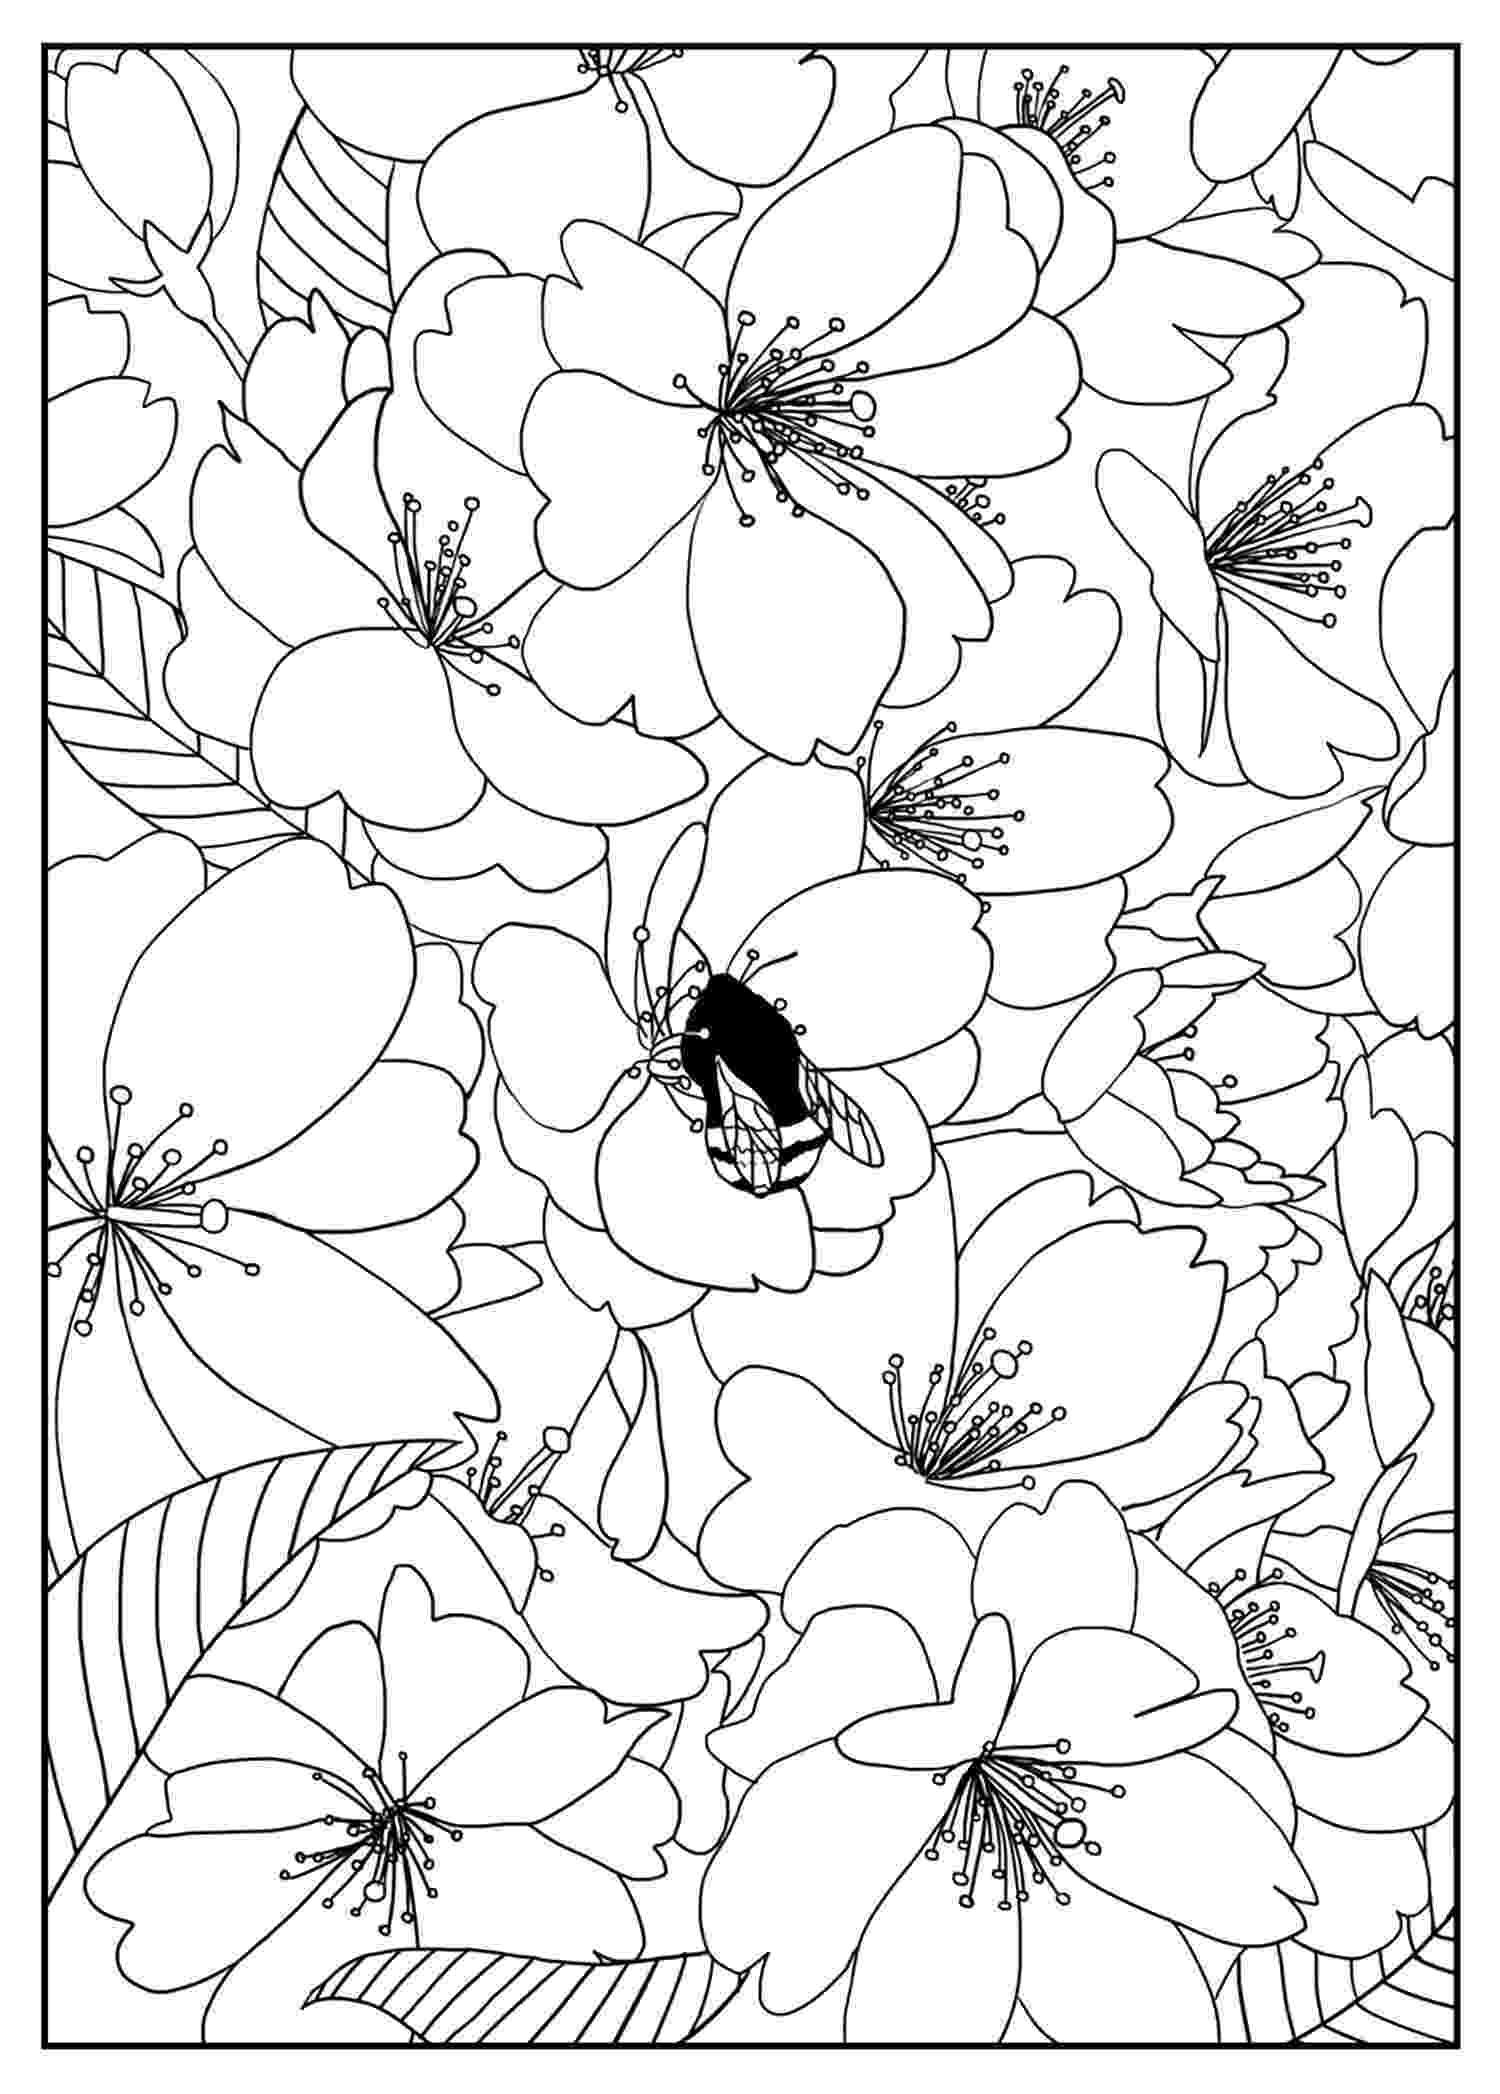 flowers printable coloring pages dancing flowers spring coloring sheet allfreekidscraftscom coloring pages printable flowers